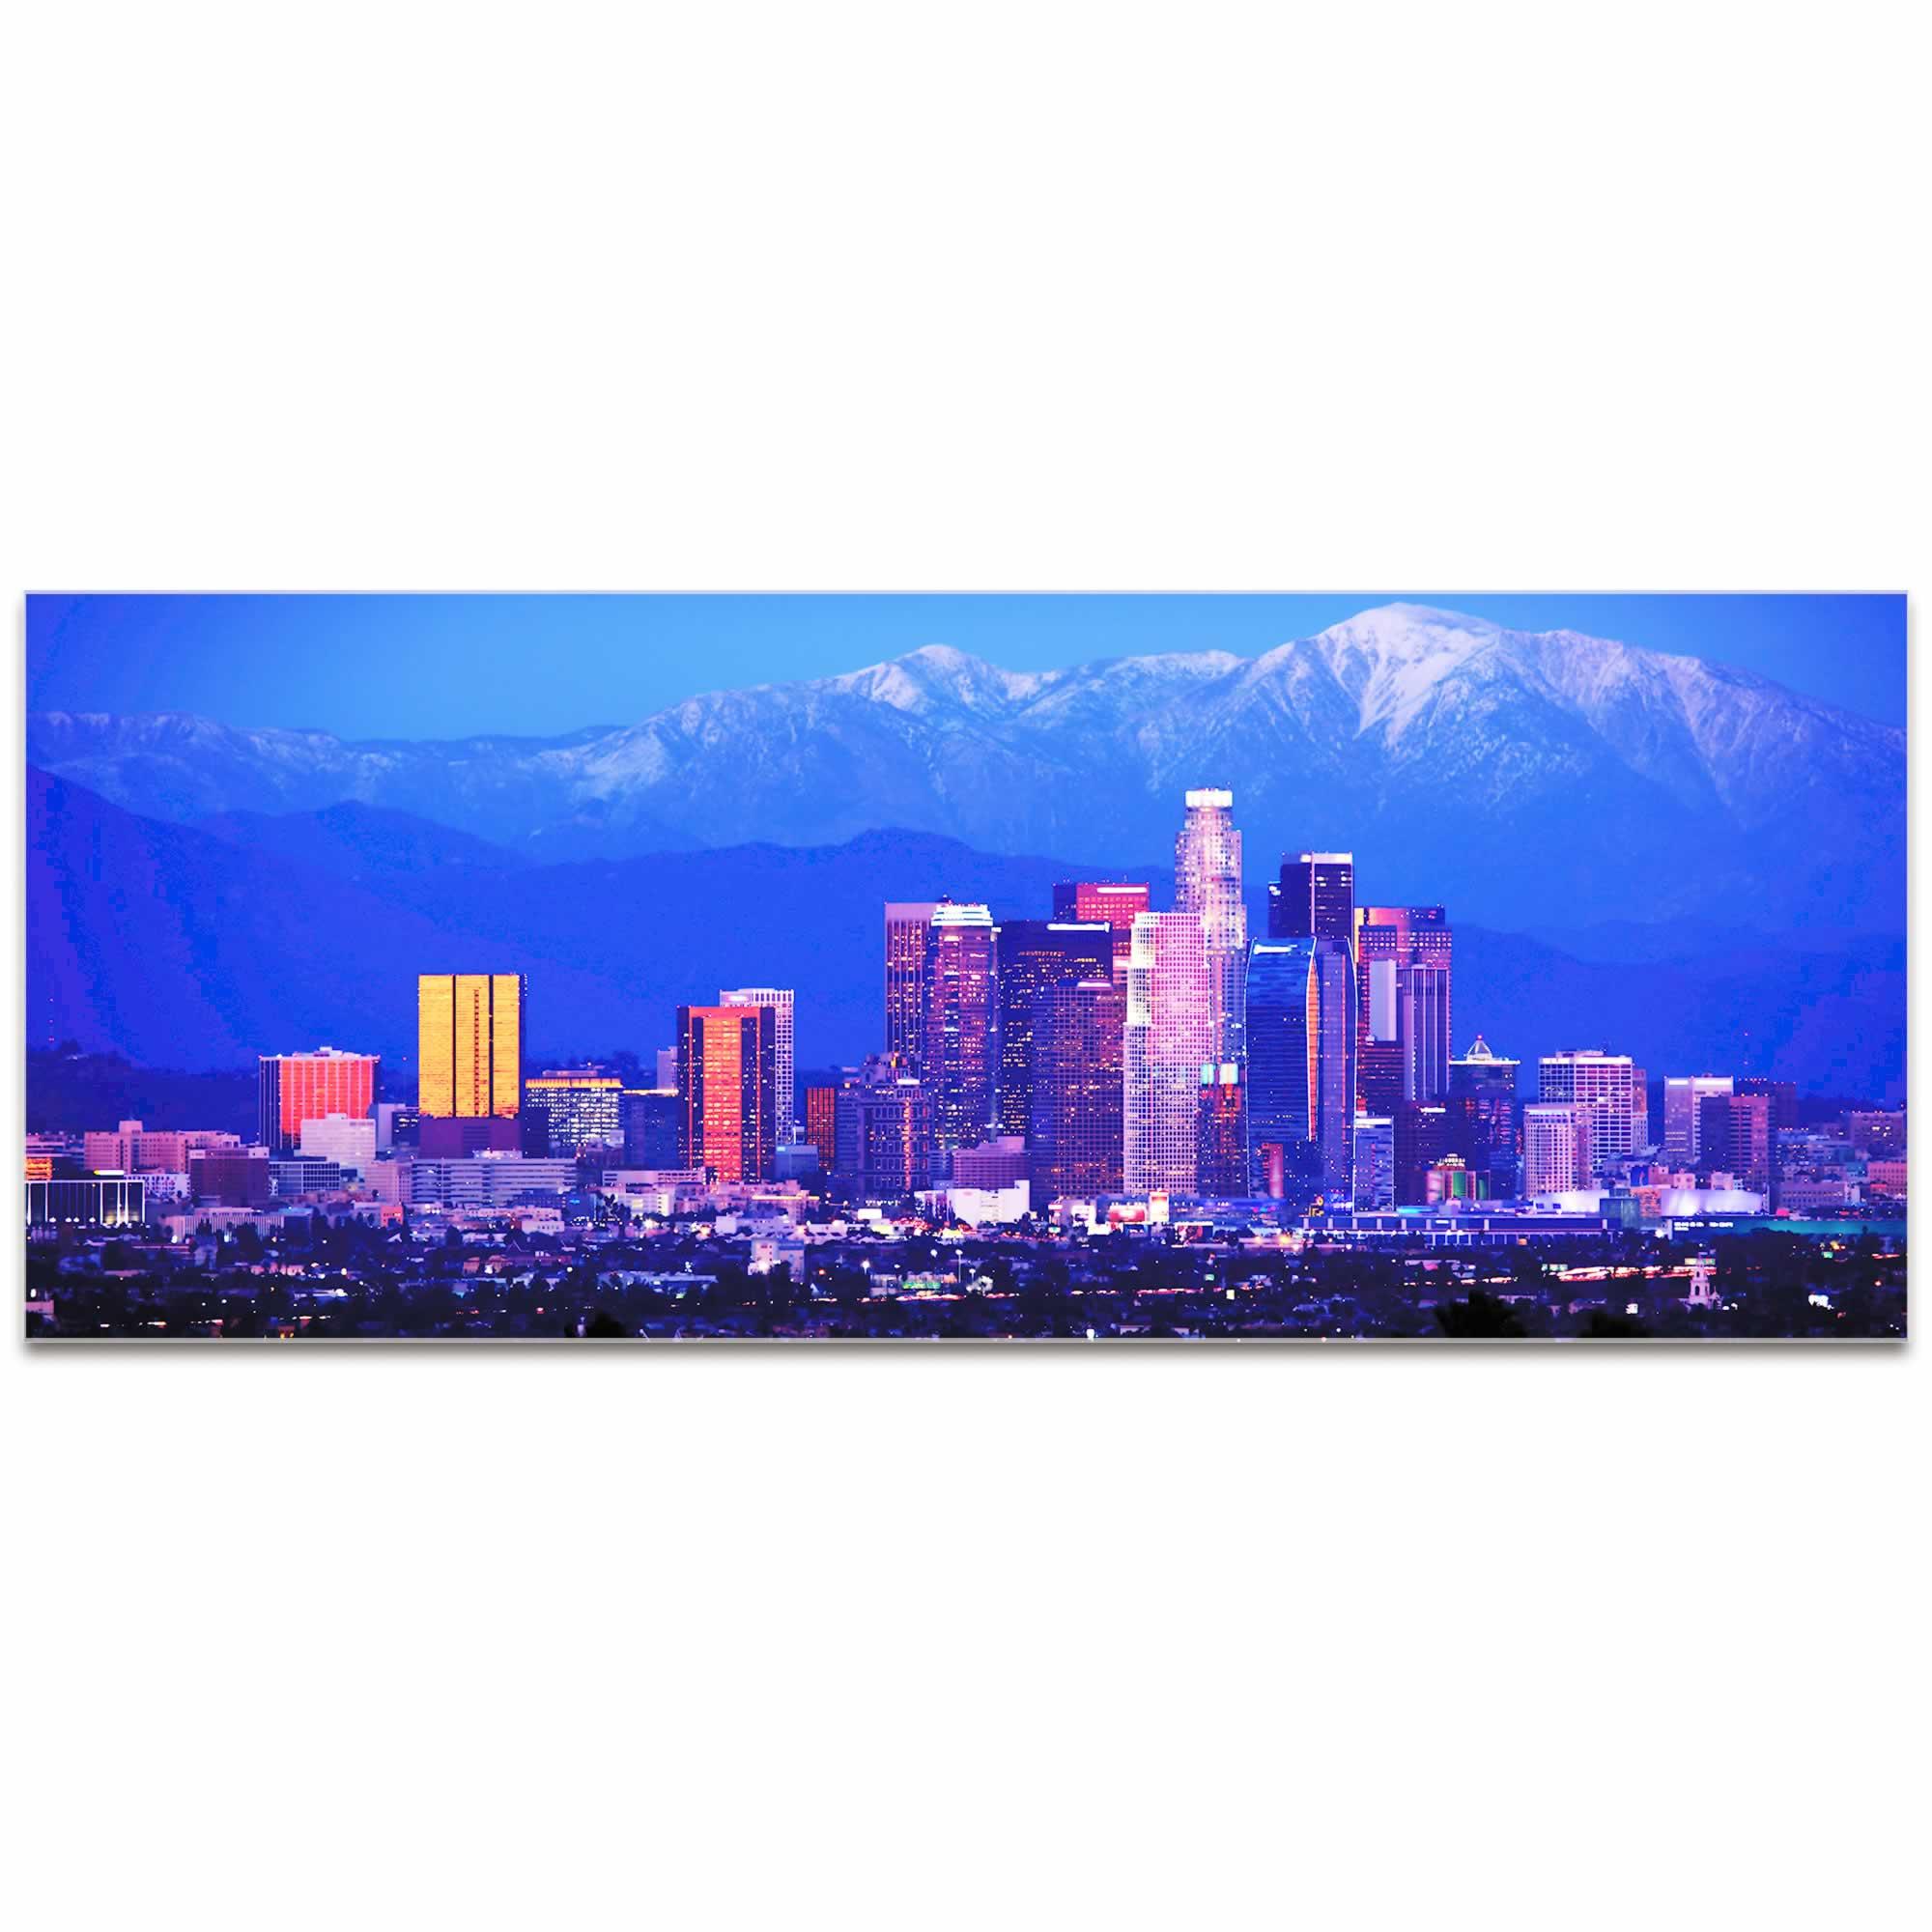 Los Angeles City Skyline - Urban Modern Art, Designer Home Decor, Cityscape Wall Artwork, Trendy Contemporary Art